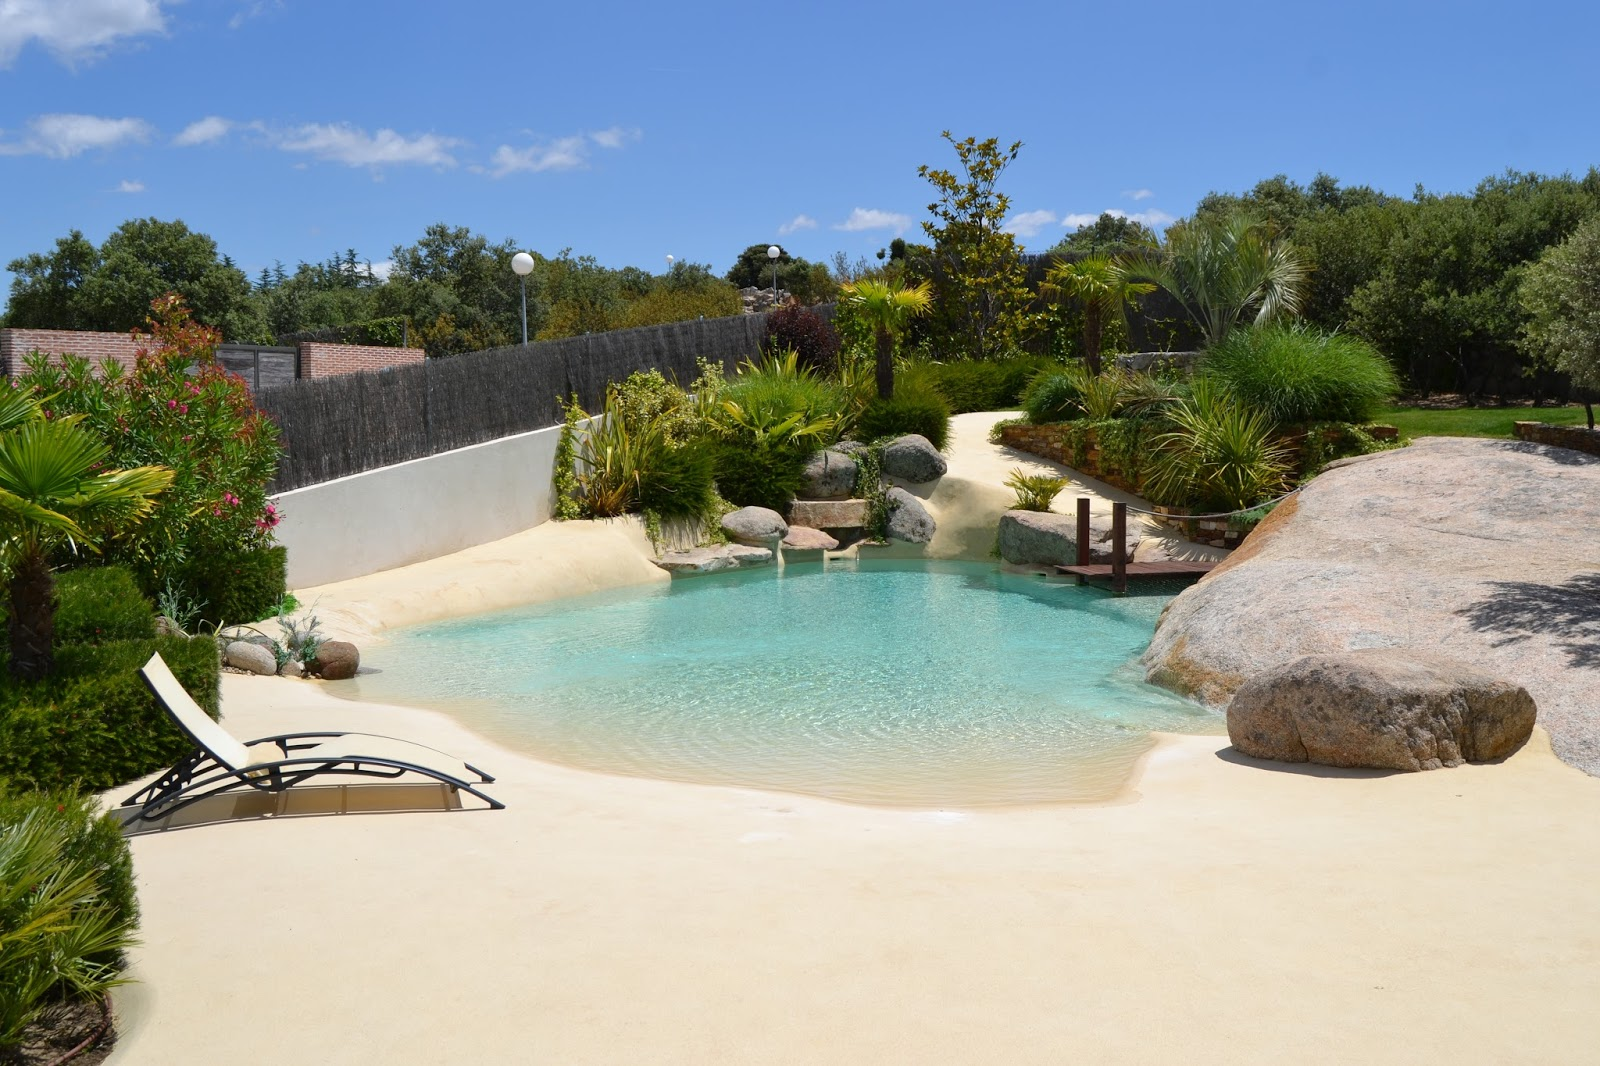 Rw paisagismo tend ncia piscinas 39 quase 39 naturais - Piscinas de arena opiniones ...